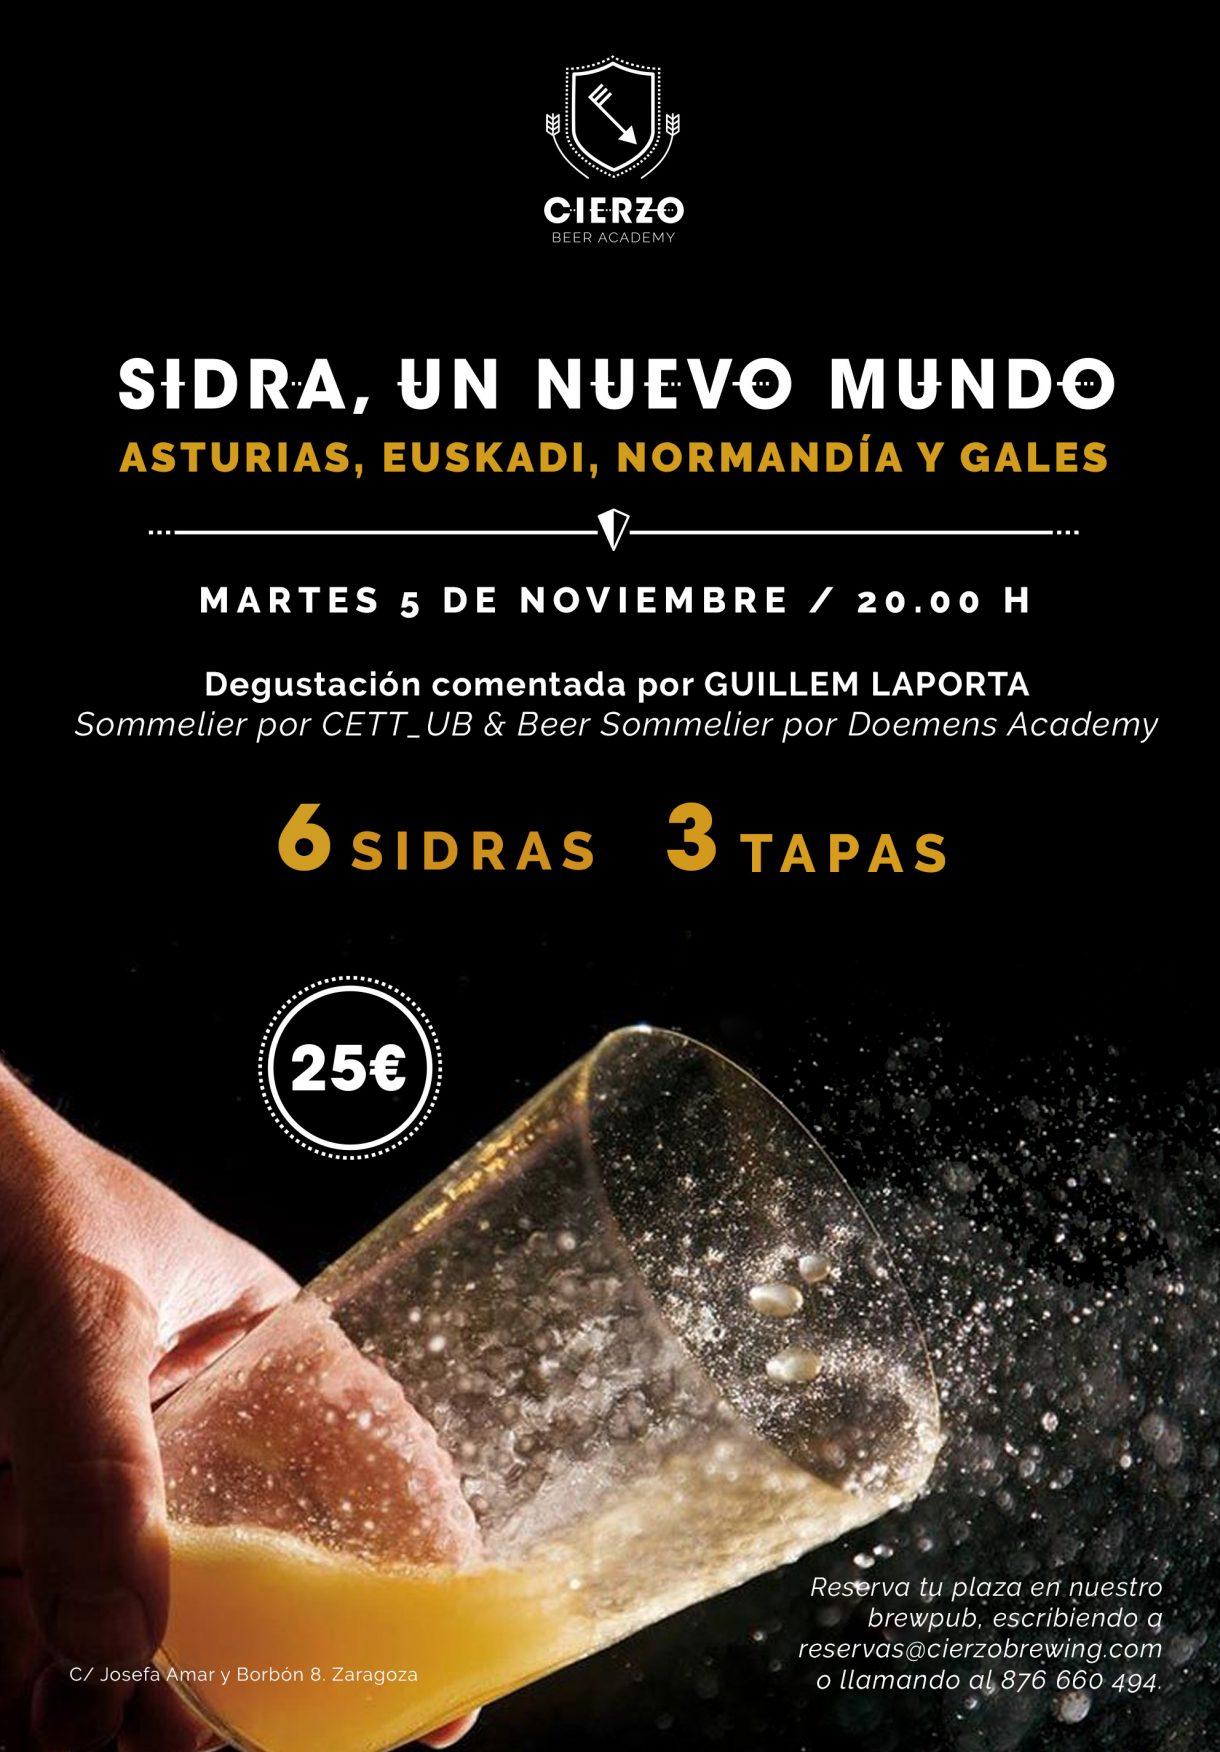 cata cena sidra asturiana vasca tapas